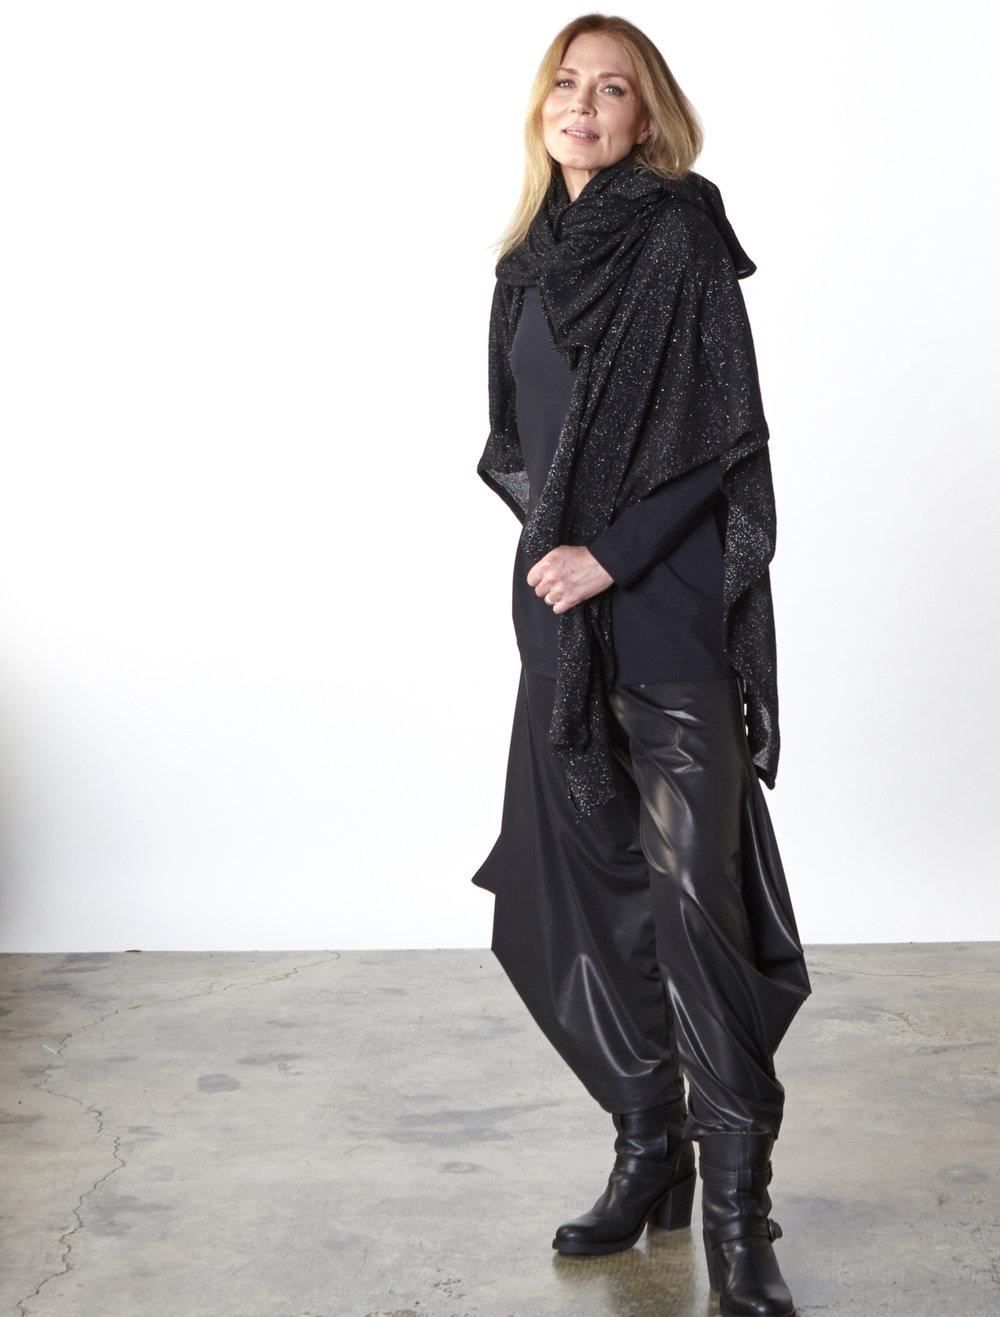 Wrap Poncho in Black Italian Sparkle Wool, Gabo Tunic in Black Italian Microfiber Jersey, Hamish Pant in Black Italian Laminato